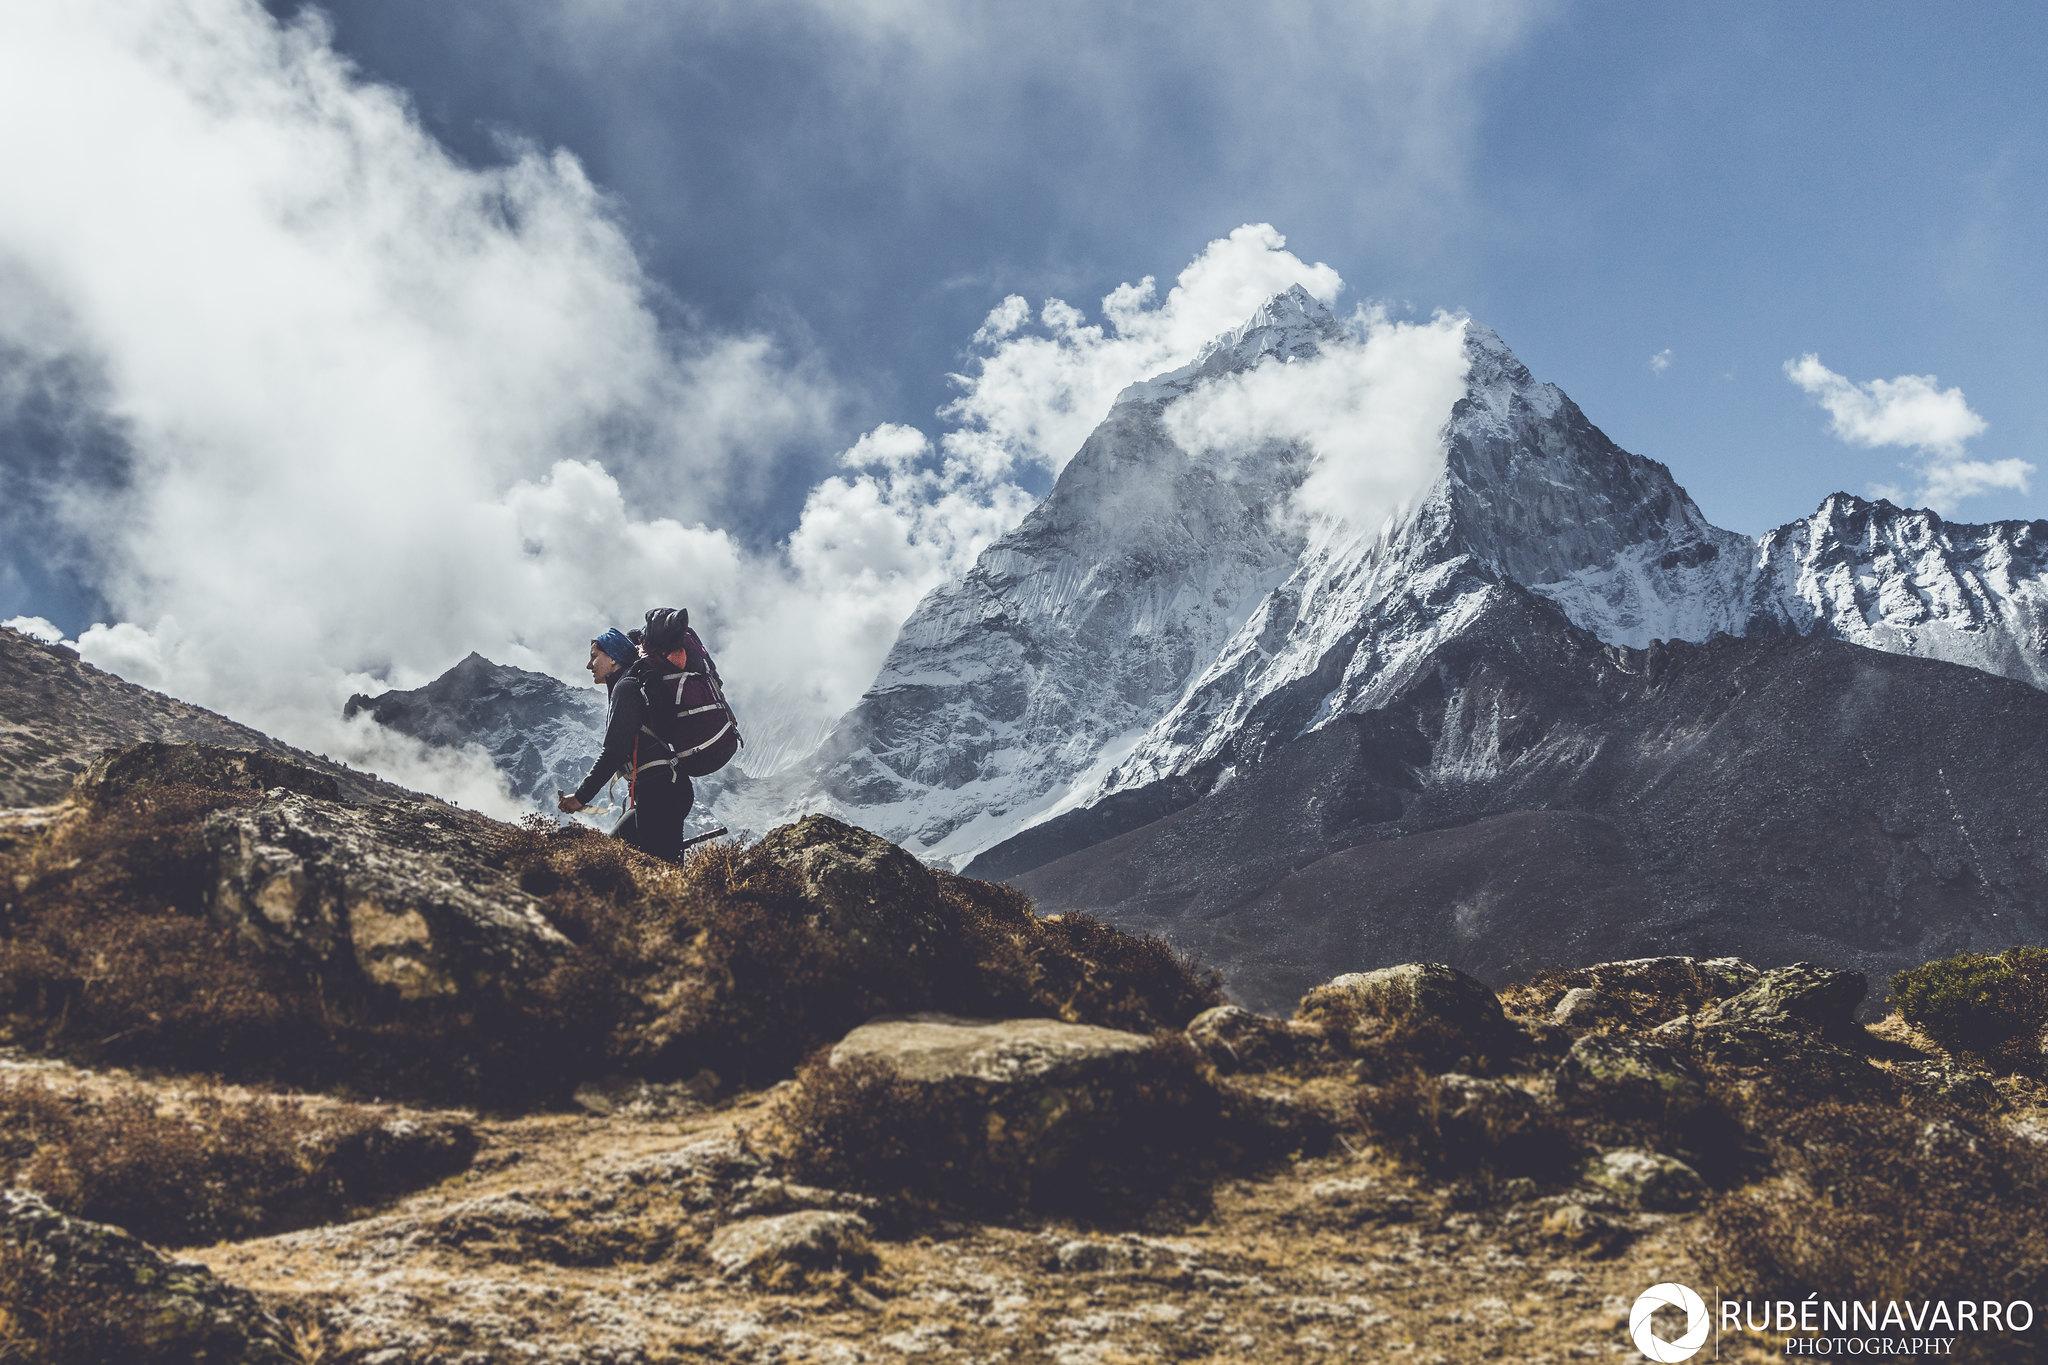 Cumplir un sueño - Trekking campo base Everest